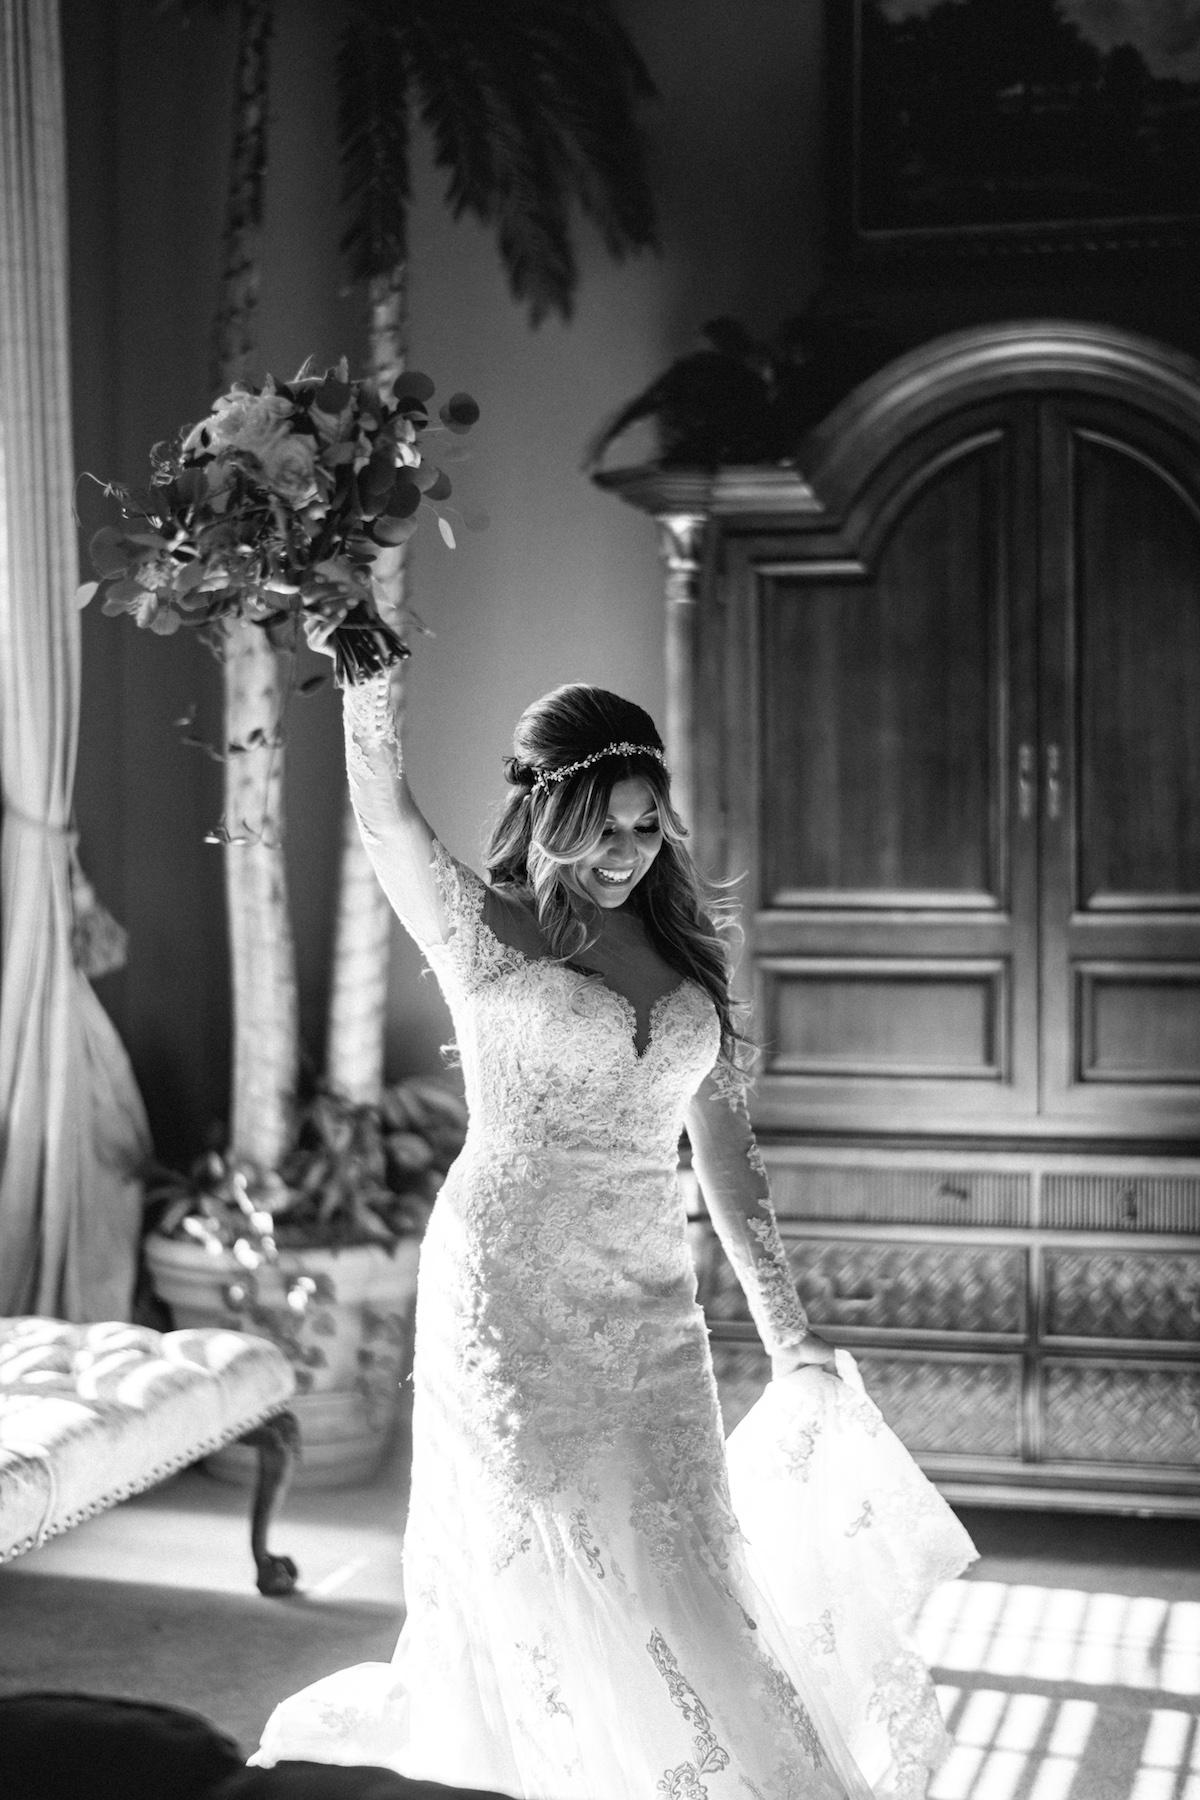 Naples Bride Wedding Matt Steeves Photography.jpg